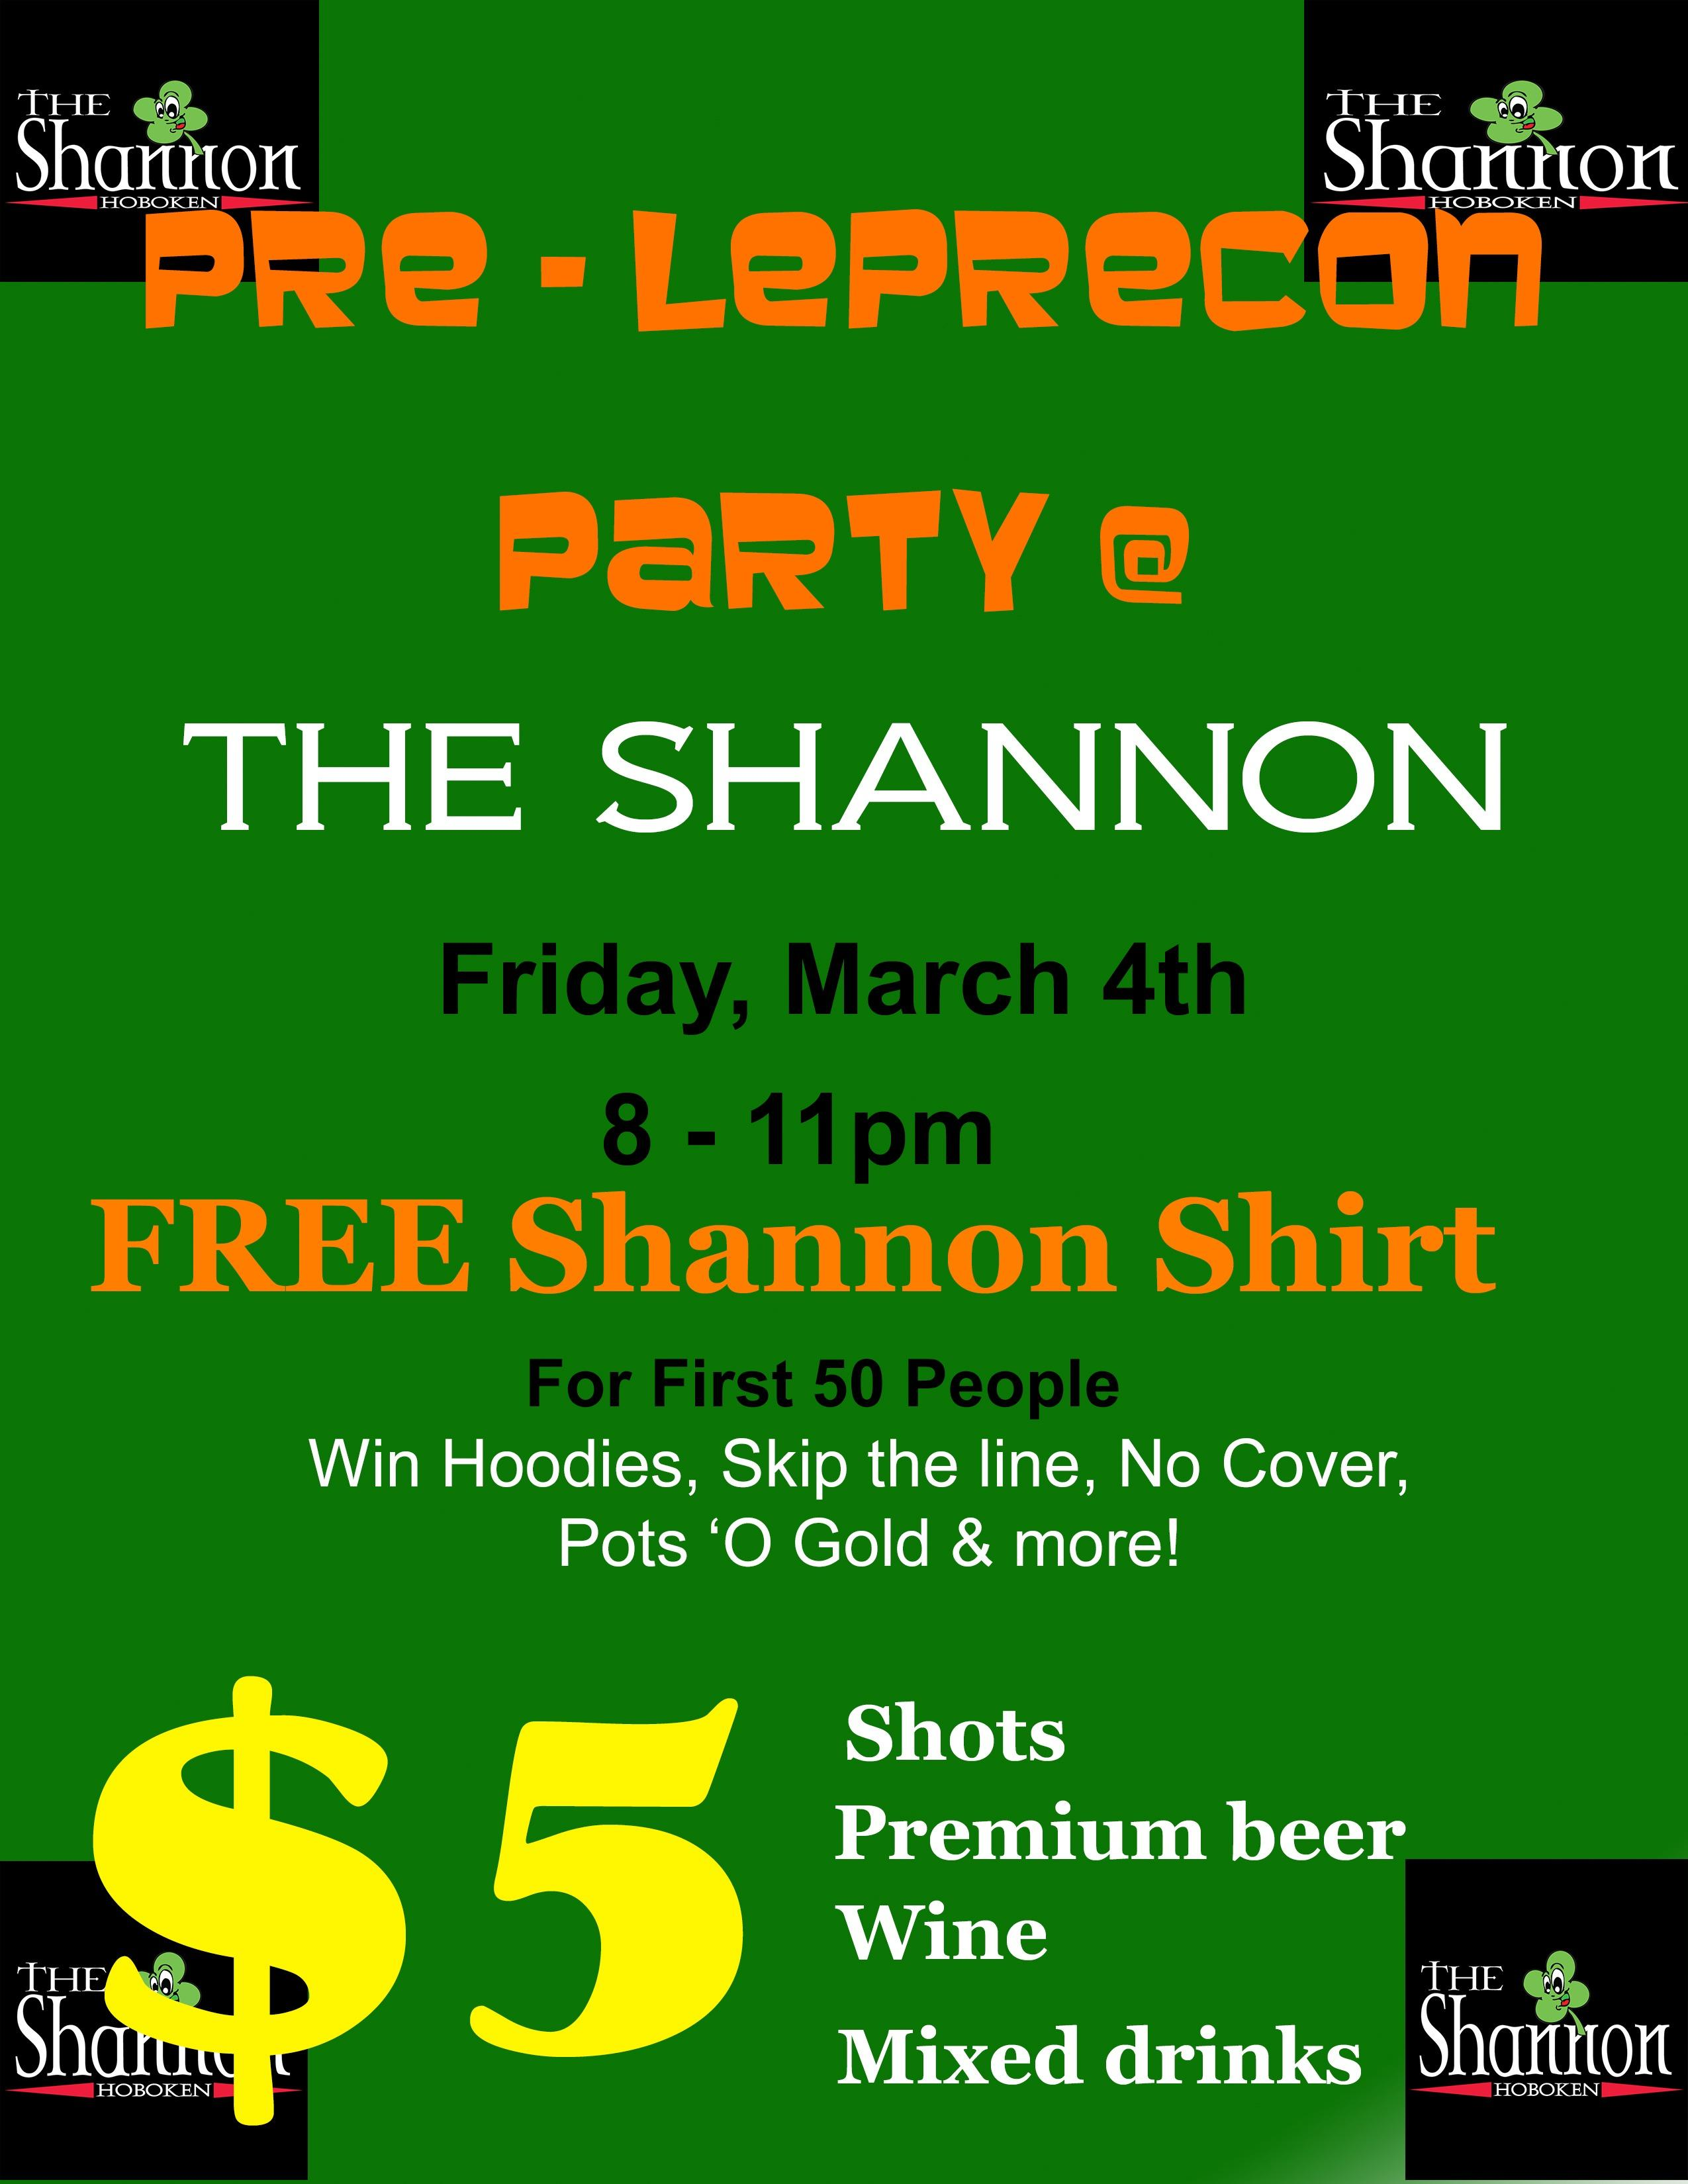 The Shannon - Hoboken, NJ